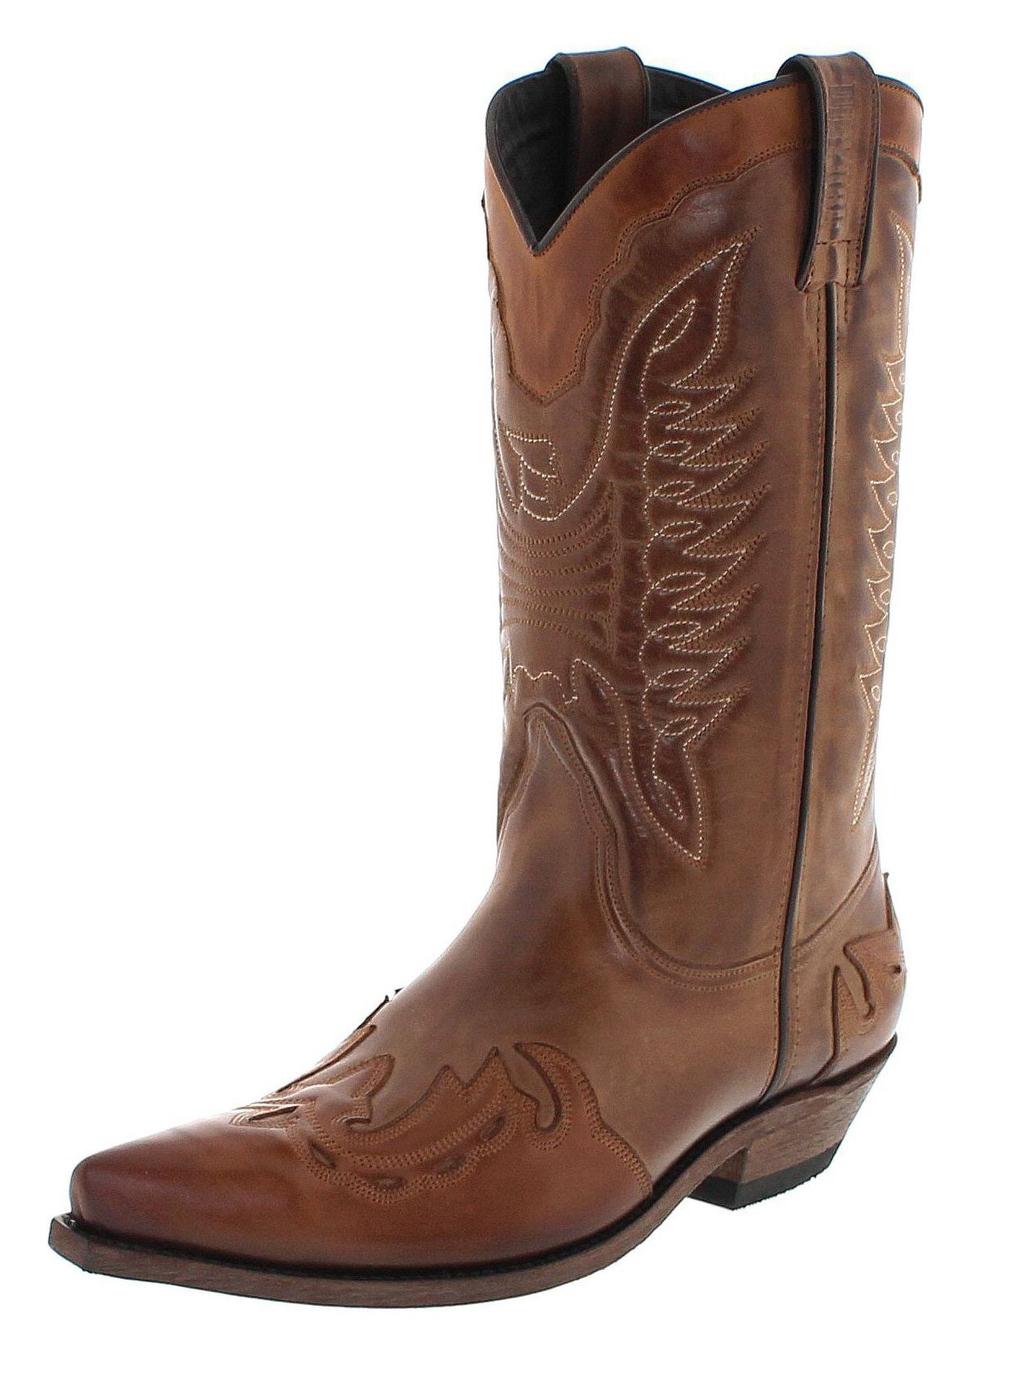 Mayura Boots MB017 Taupe Ecotan Western boot - brown